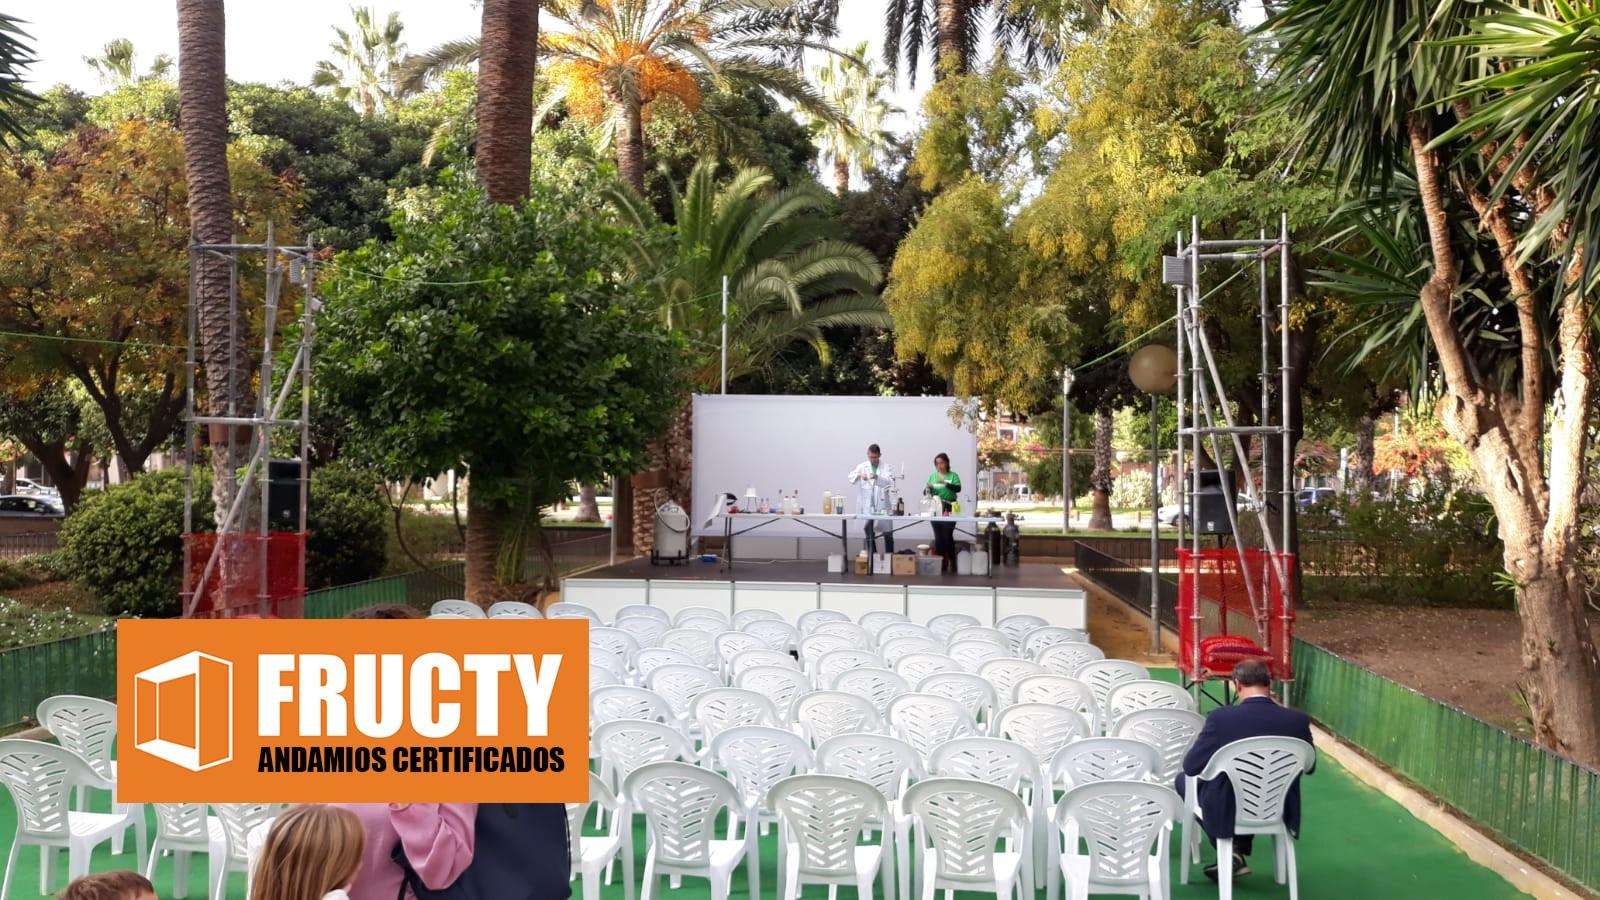 Andamios en Secyt Murcia 2018